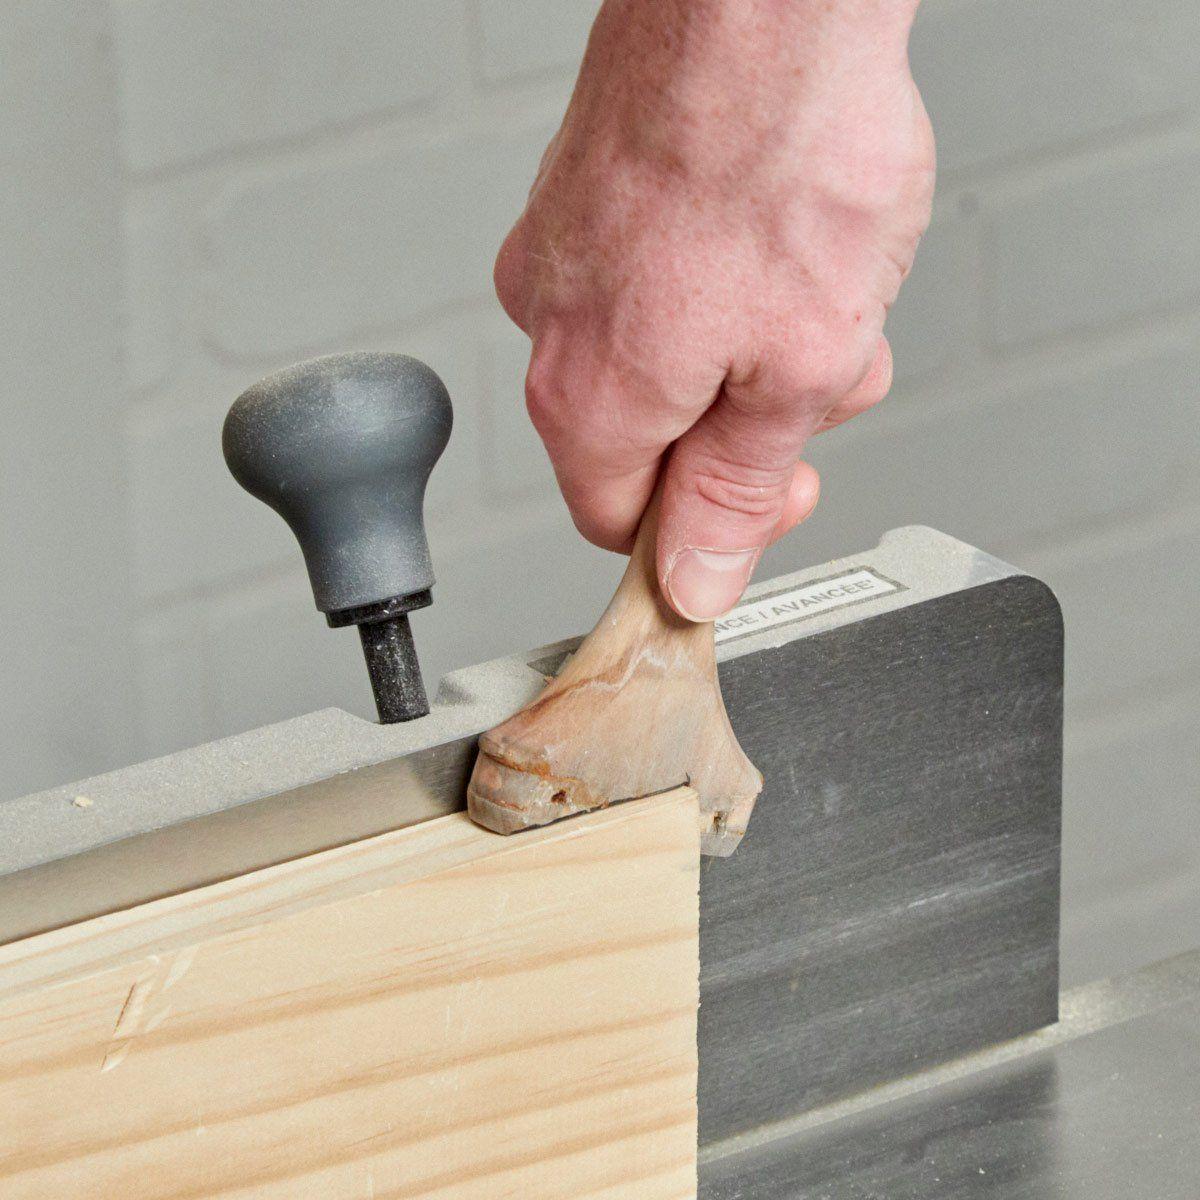 35 Money-Saving Handy Hints Using Everyday Items | The Family Handyman